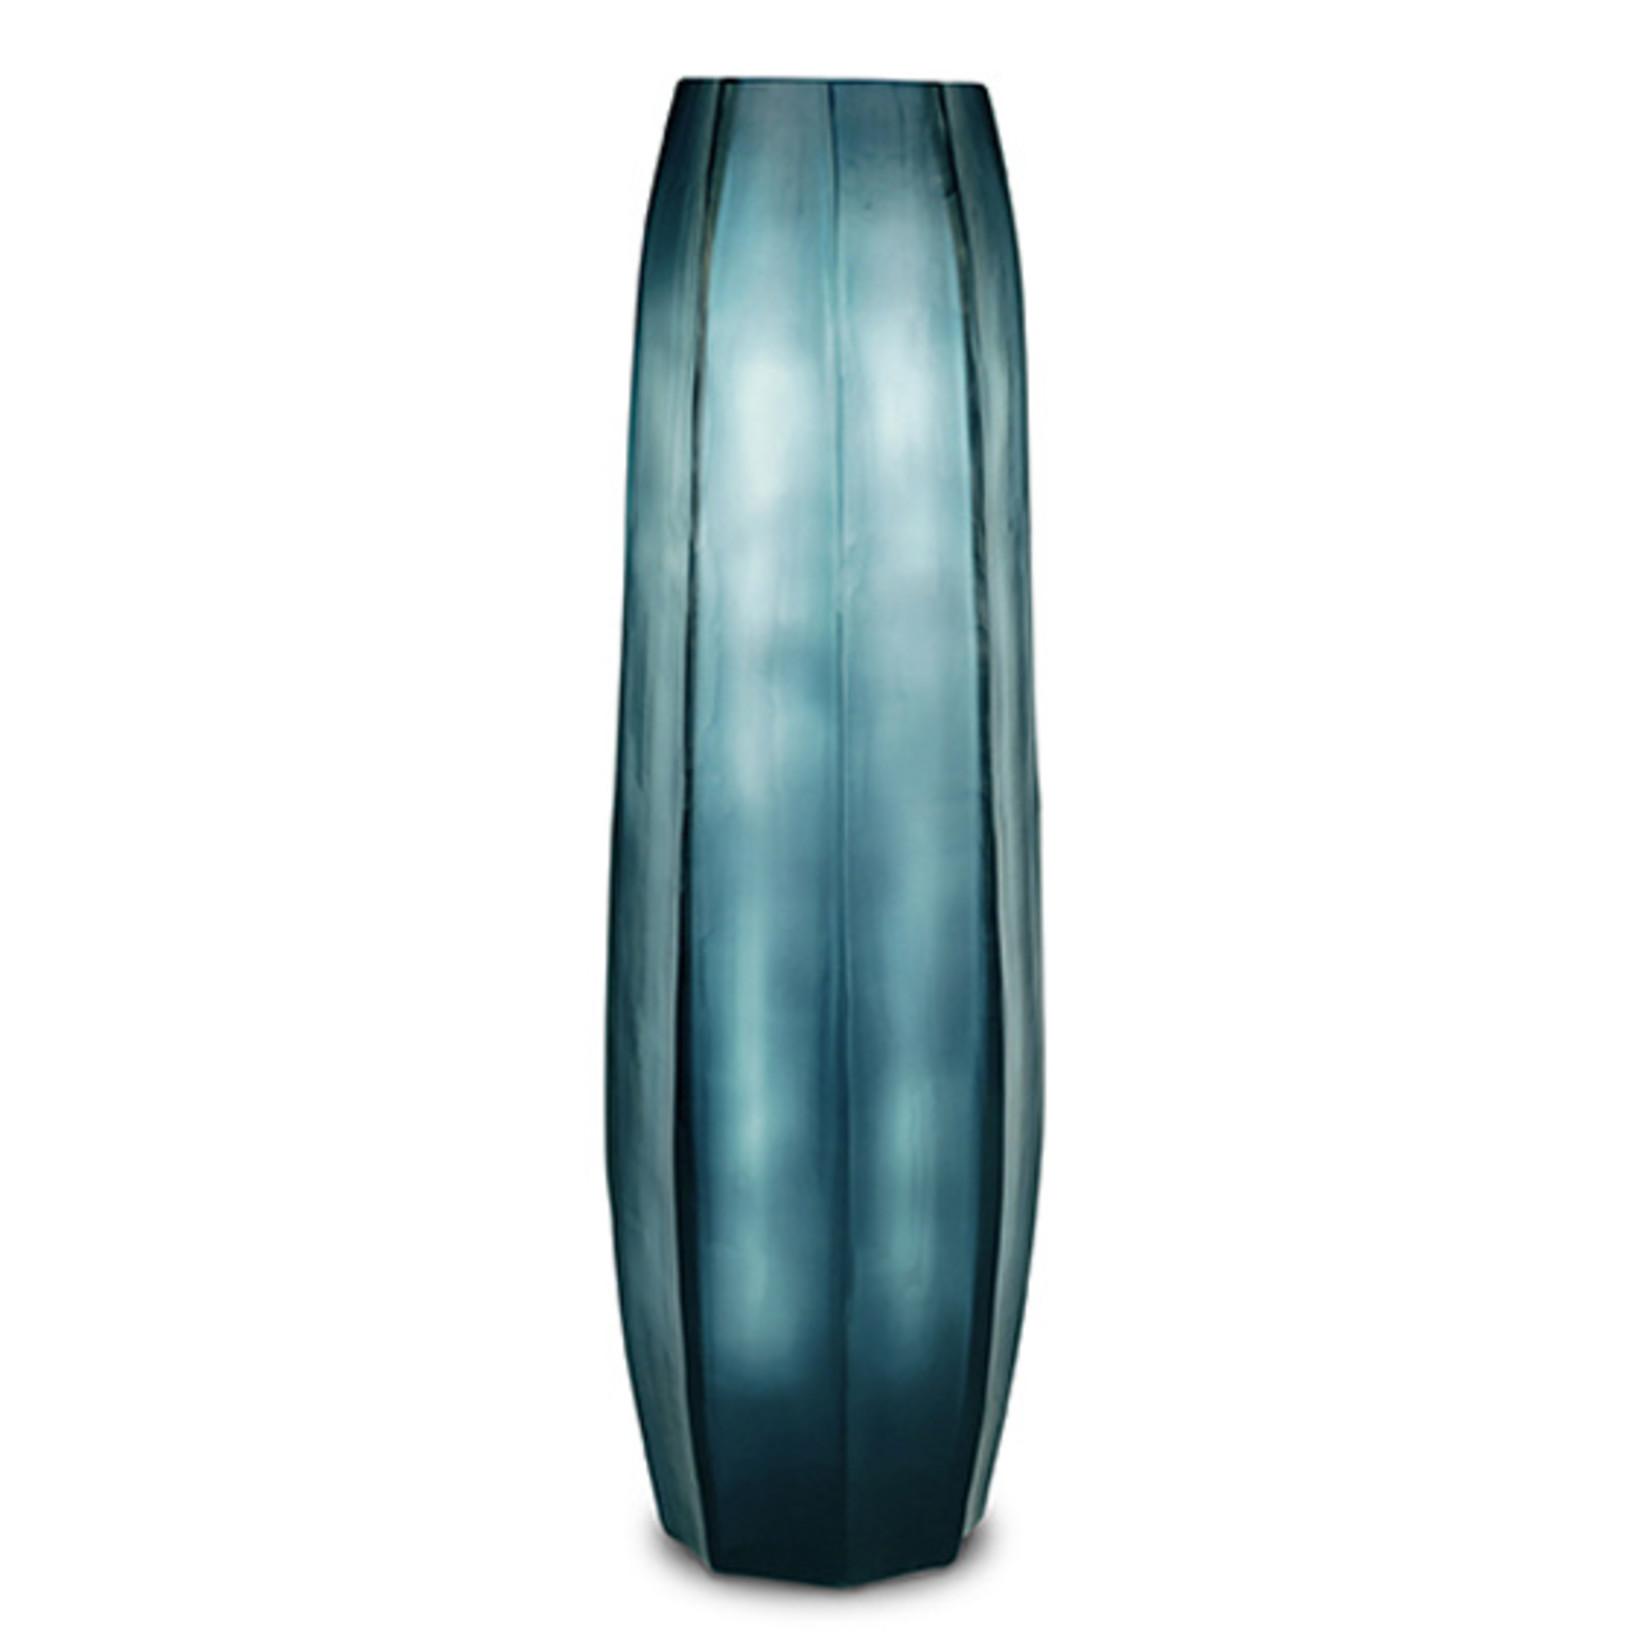 Guaxs Vase Koonam Tall   Ocean Blue / Indigo